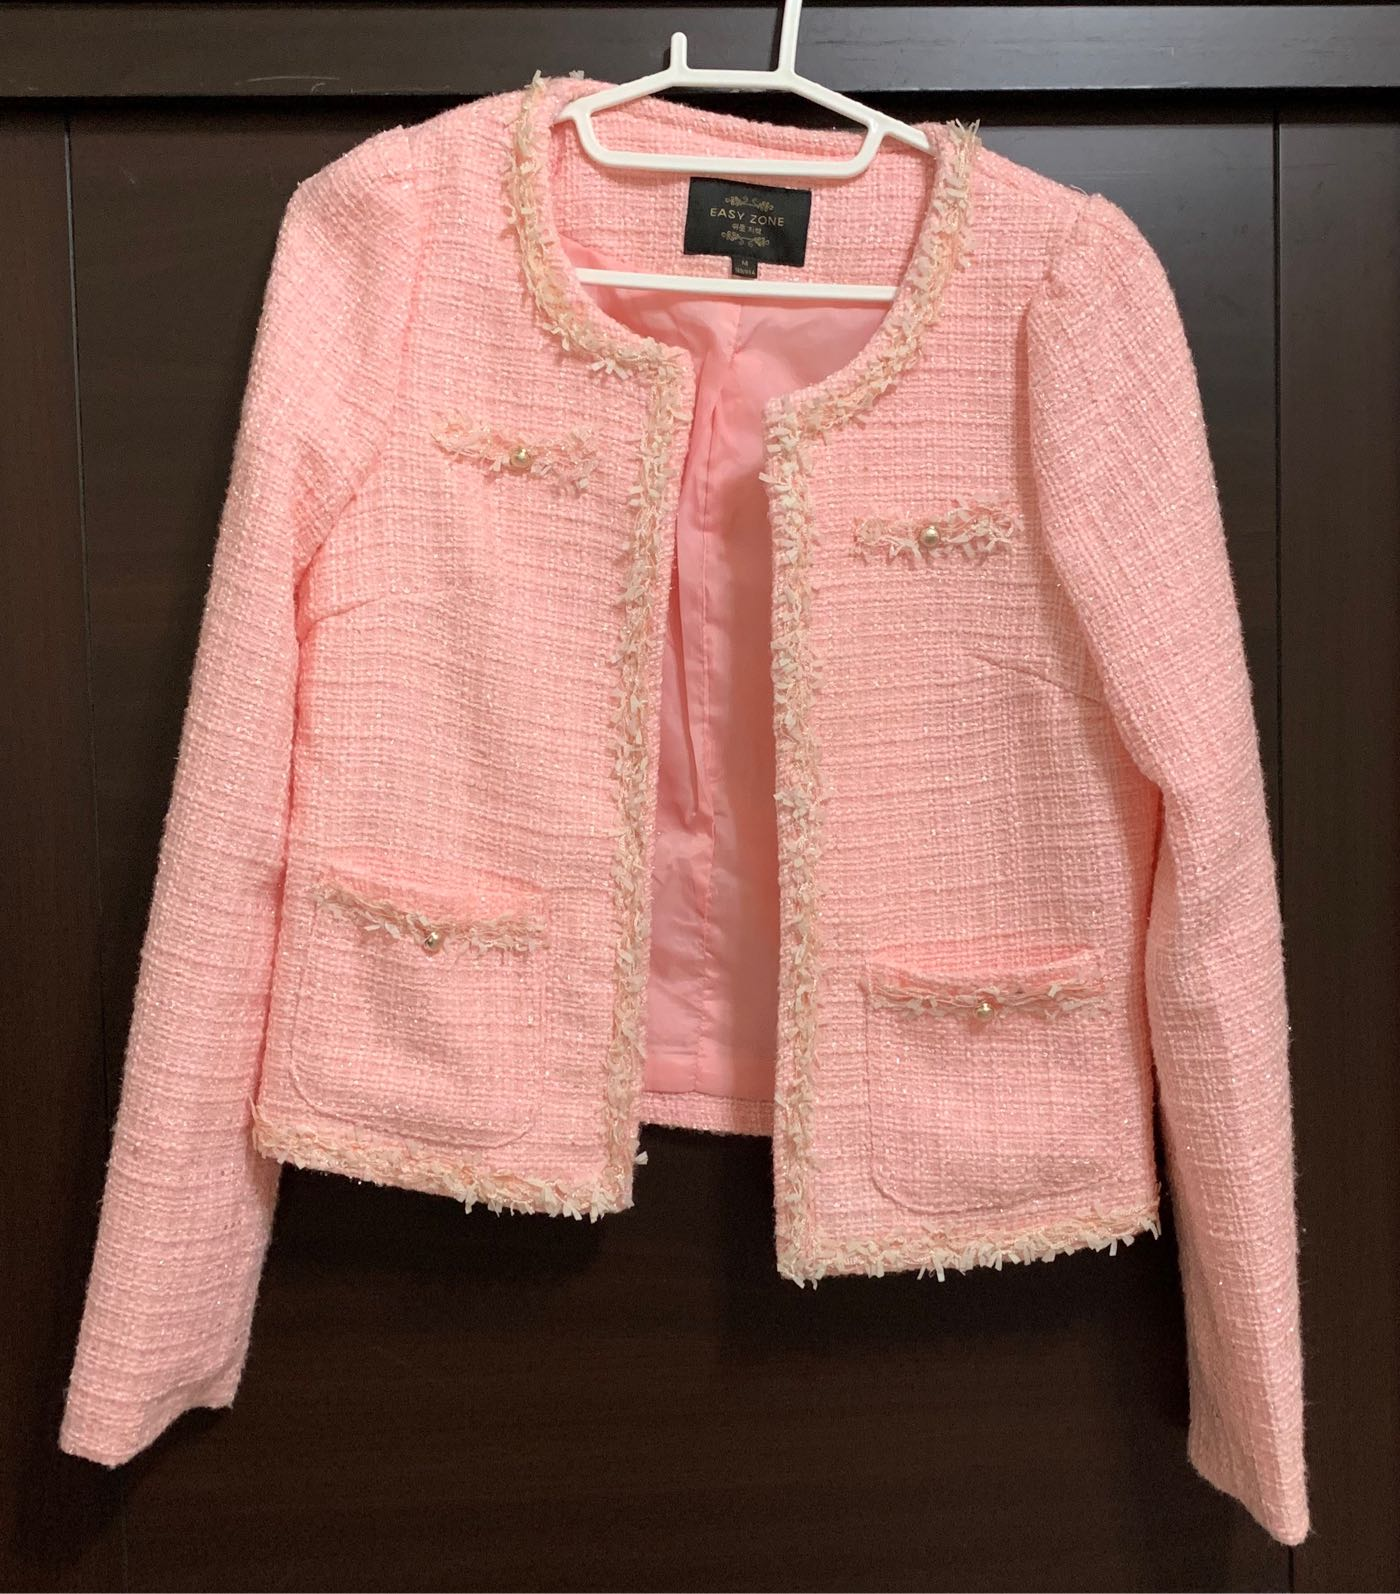 EASY ZONE粉色短外套—近全新免運